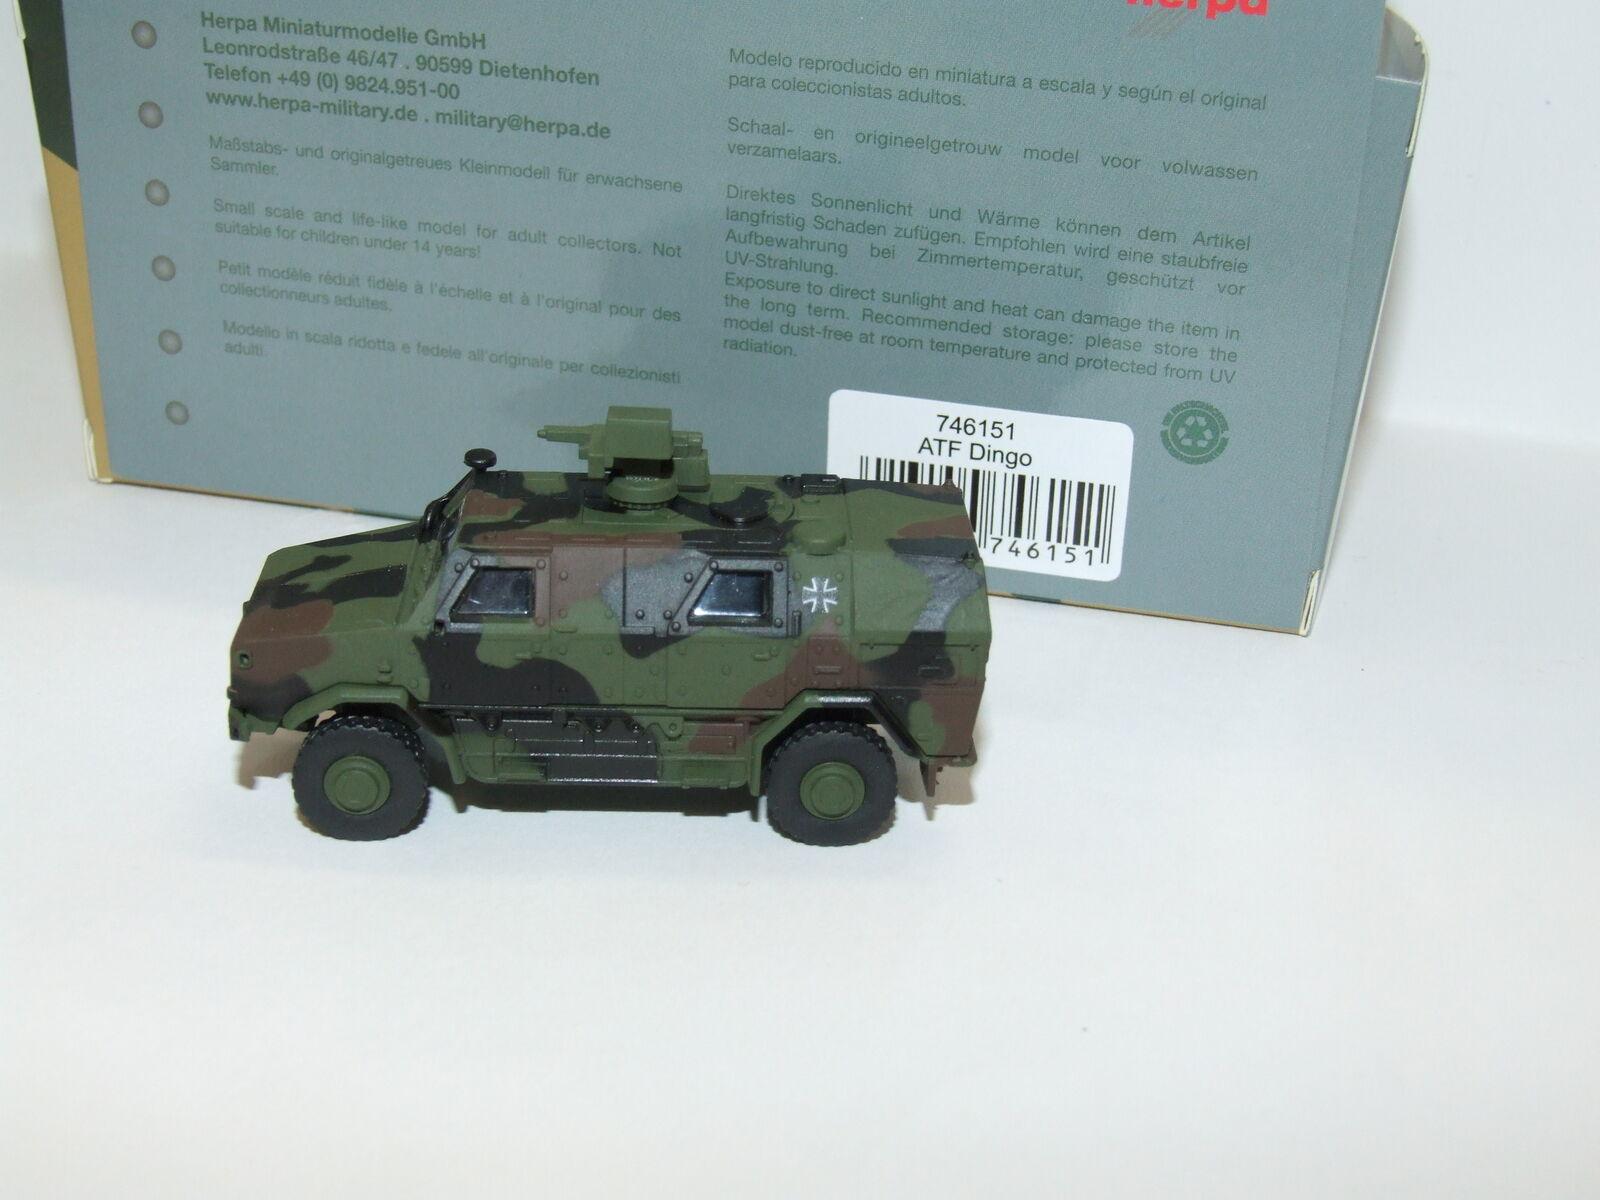 Herpa Military Military Military 746151 ATF Dingo mit FLW 100, dekoriert 1 87 d691a5